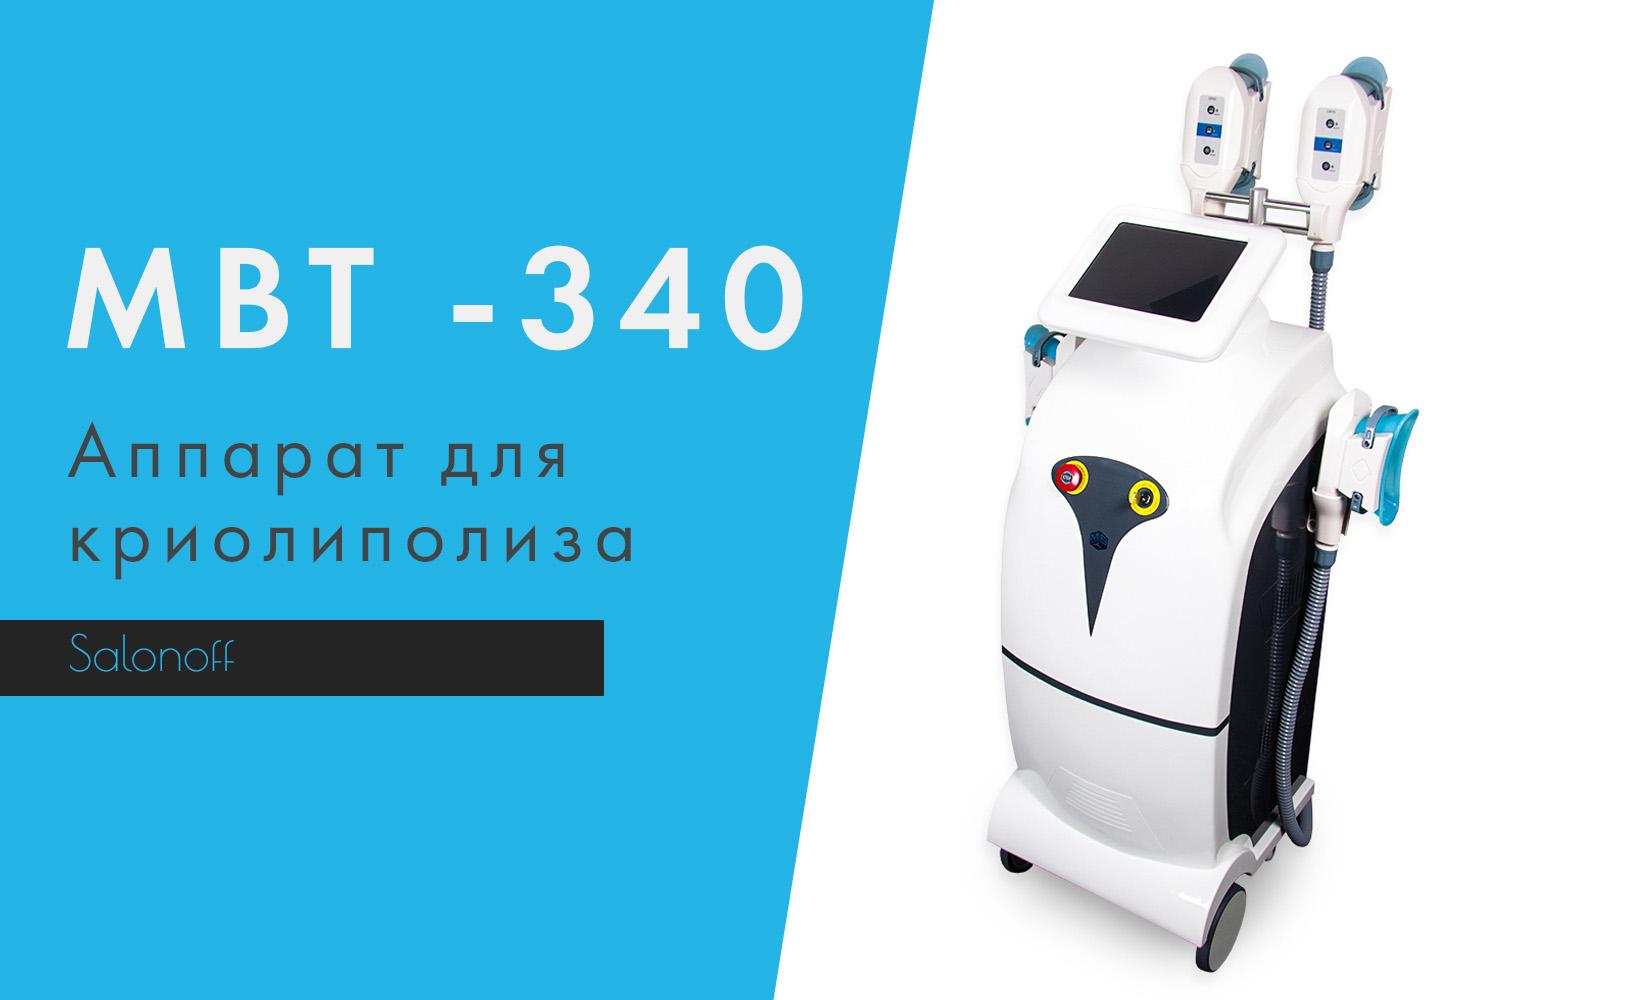 main - МВТ-340 - обзор аппарата для криолиполиза